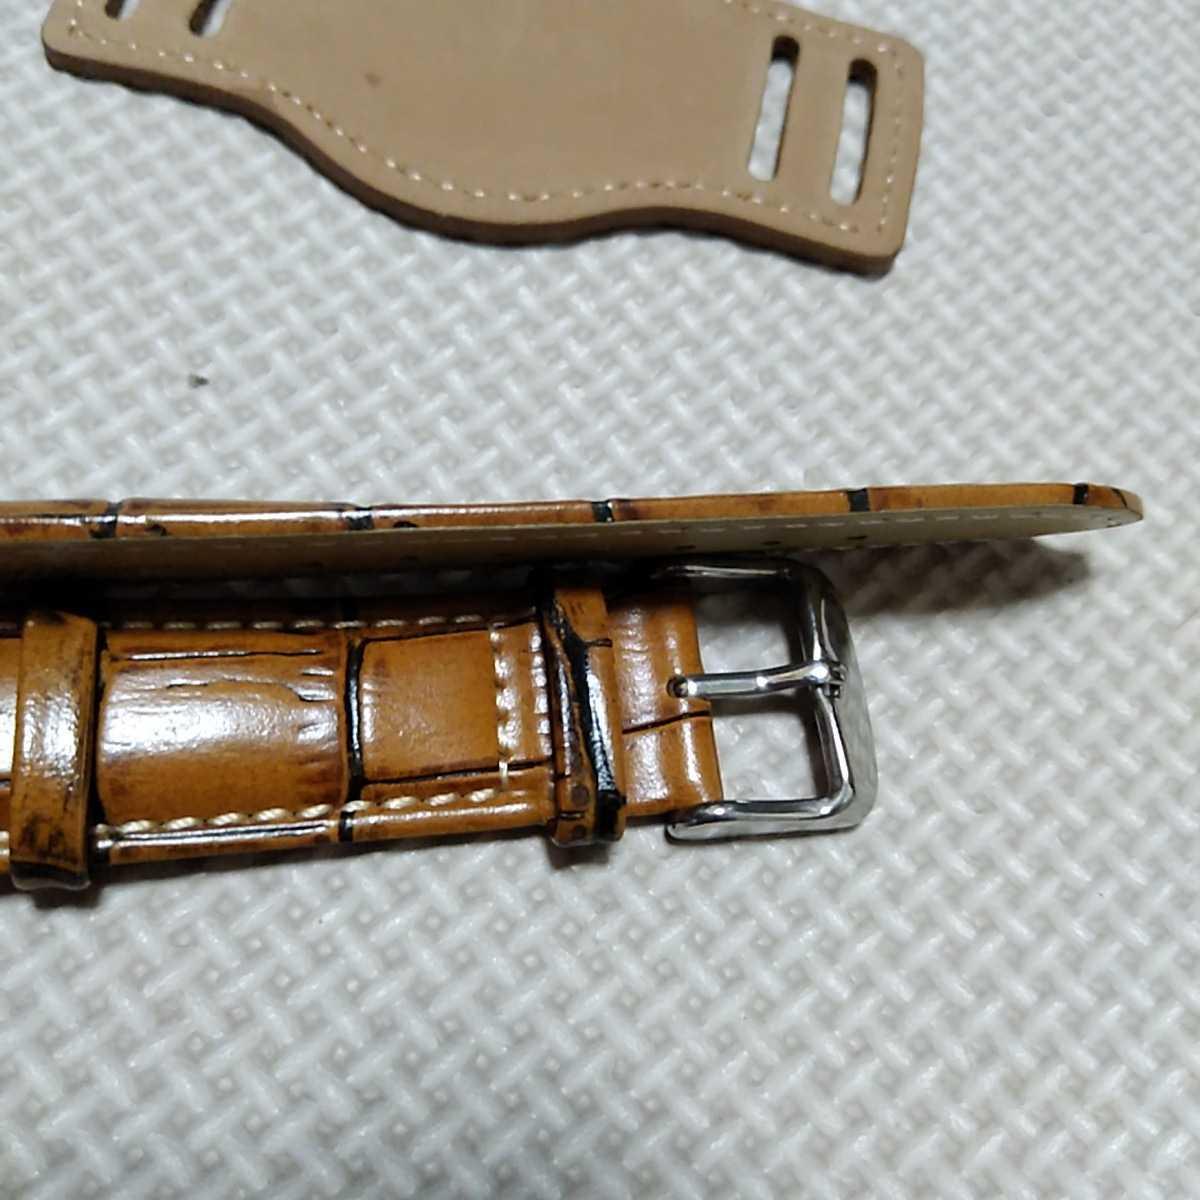 No55 ブンド BUND 本革レザーベルト 腕時計ベルト 交換用ストラップ ブラウン クロコ型押し 20mm 未使用 高品質 ドイツパイロット 空軍_画像8